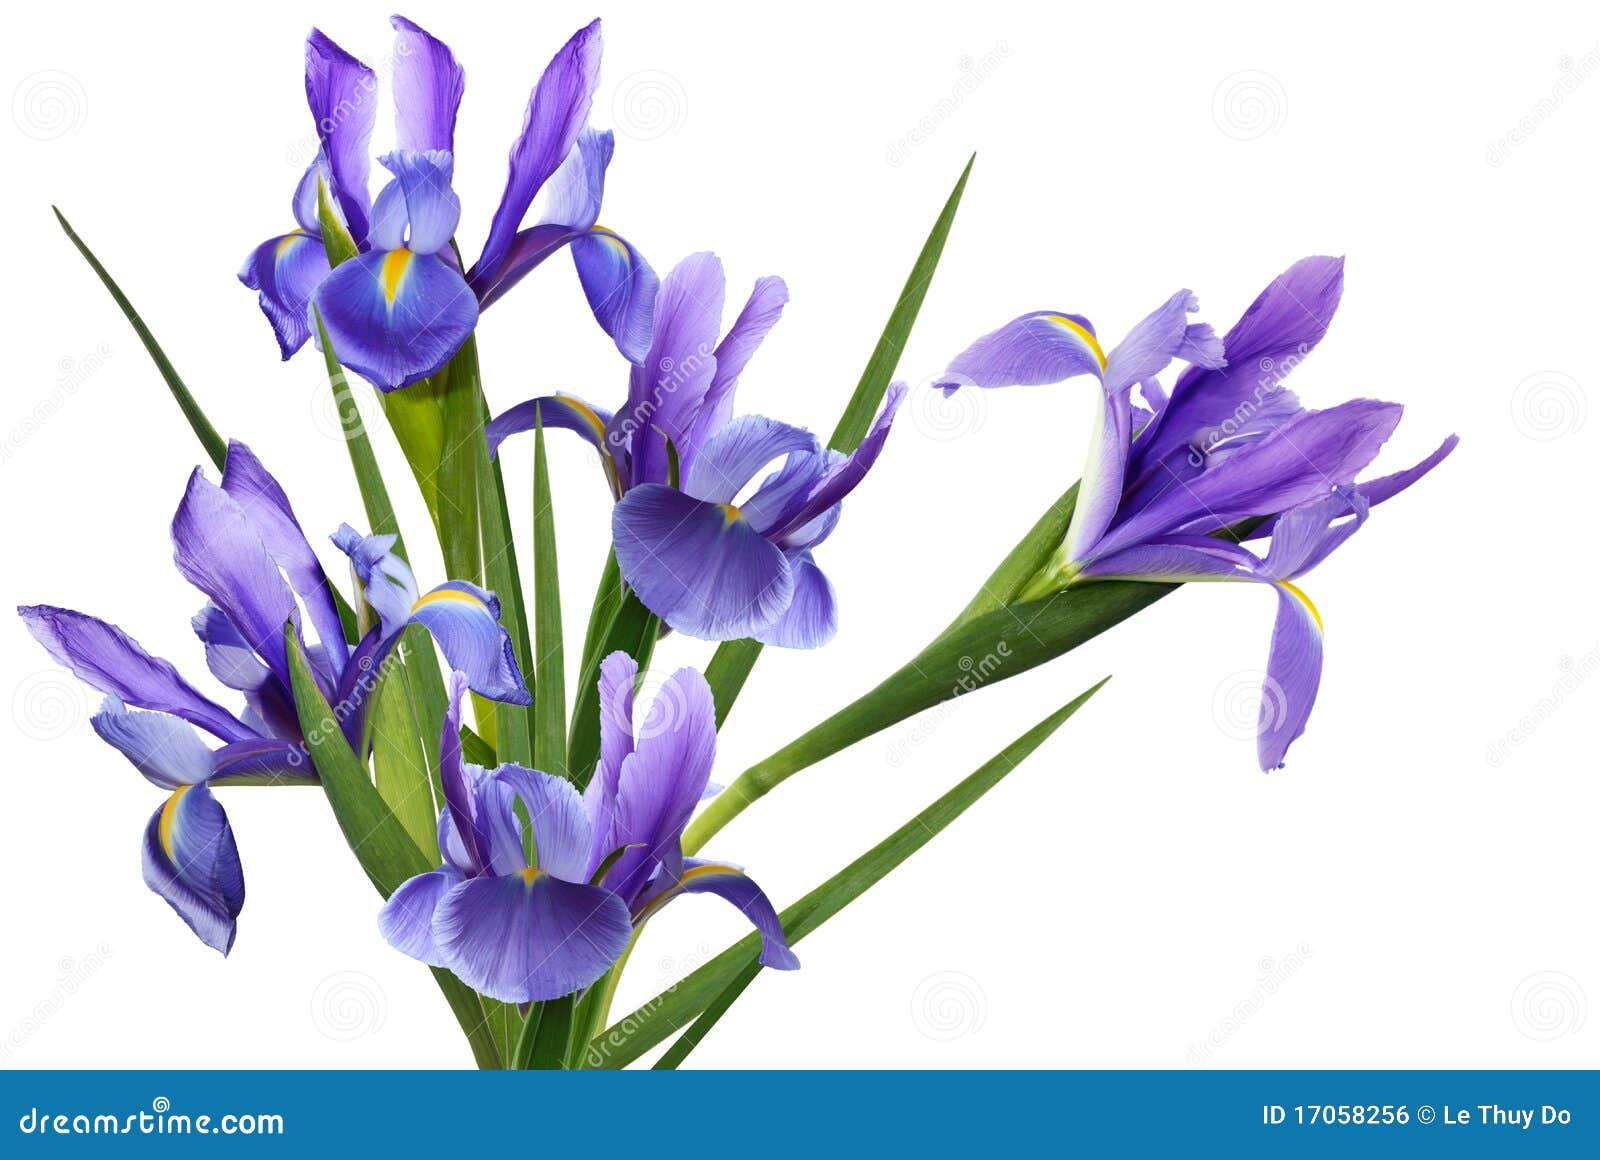 Flor azul del diafragma